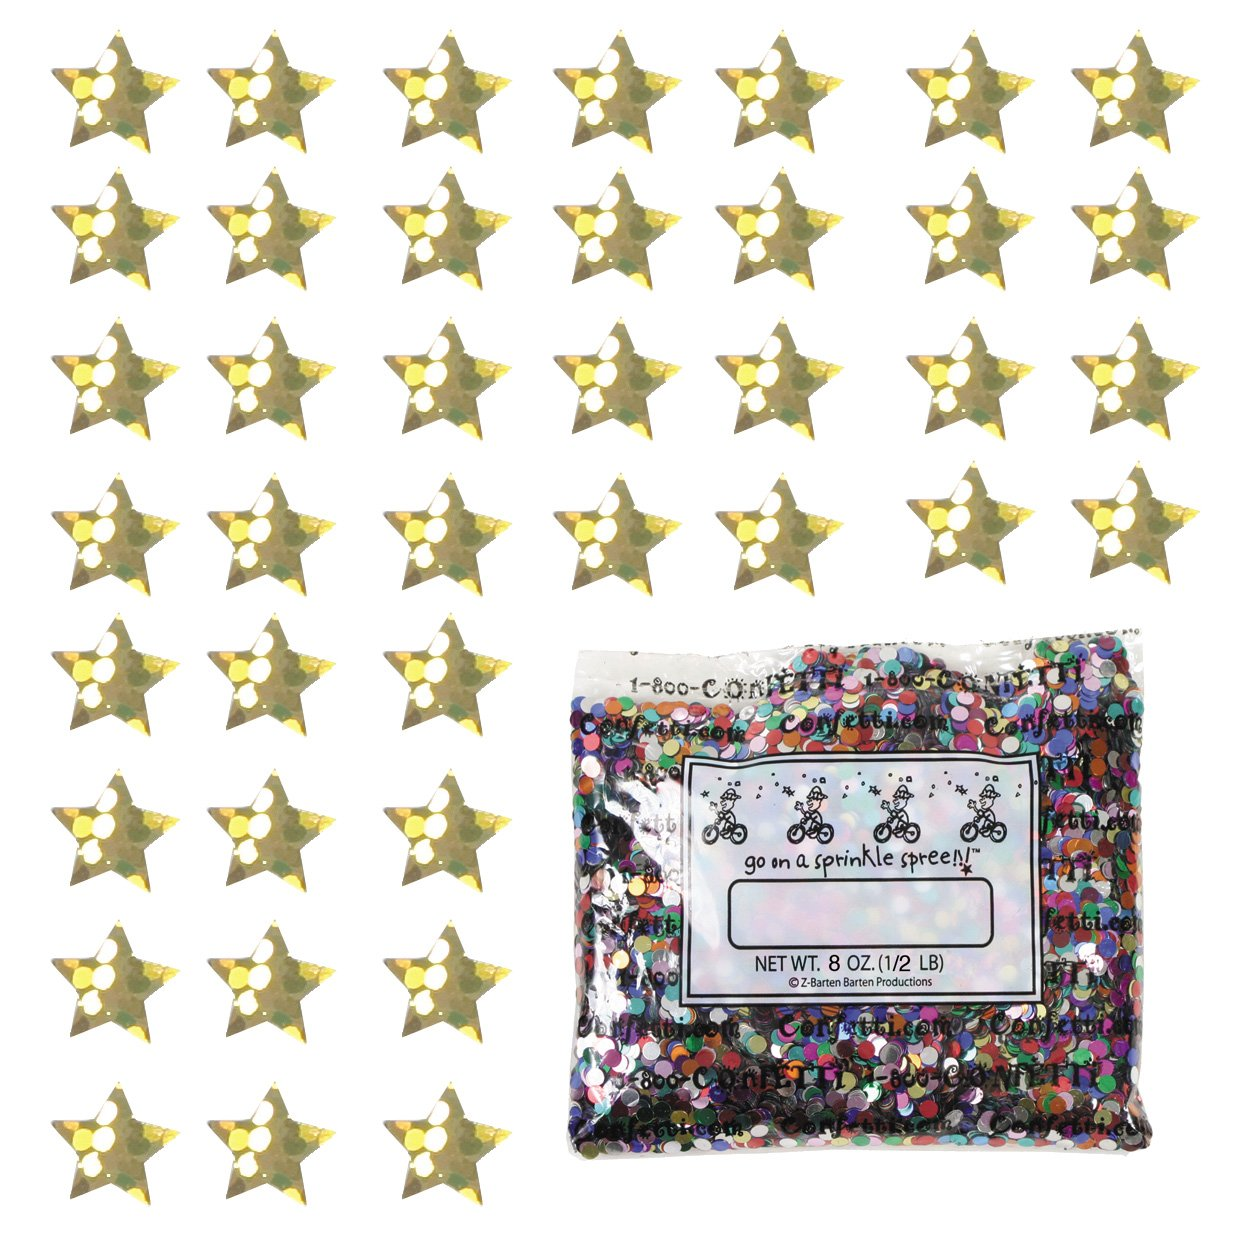 Confetti Star 1/4'' Prisma Gold - One Pound (16 oz) Free Priority Mail (9081)